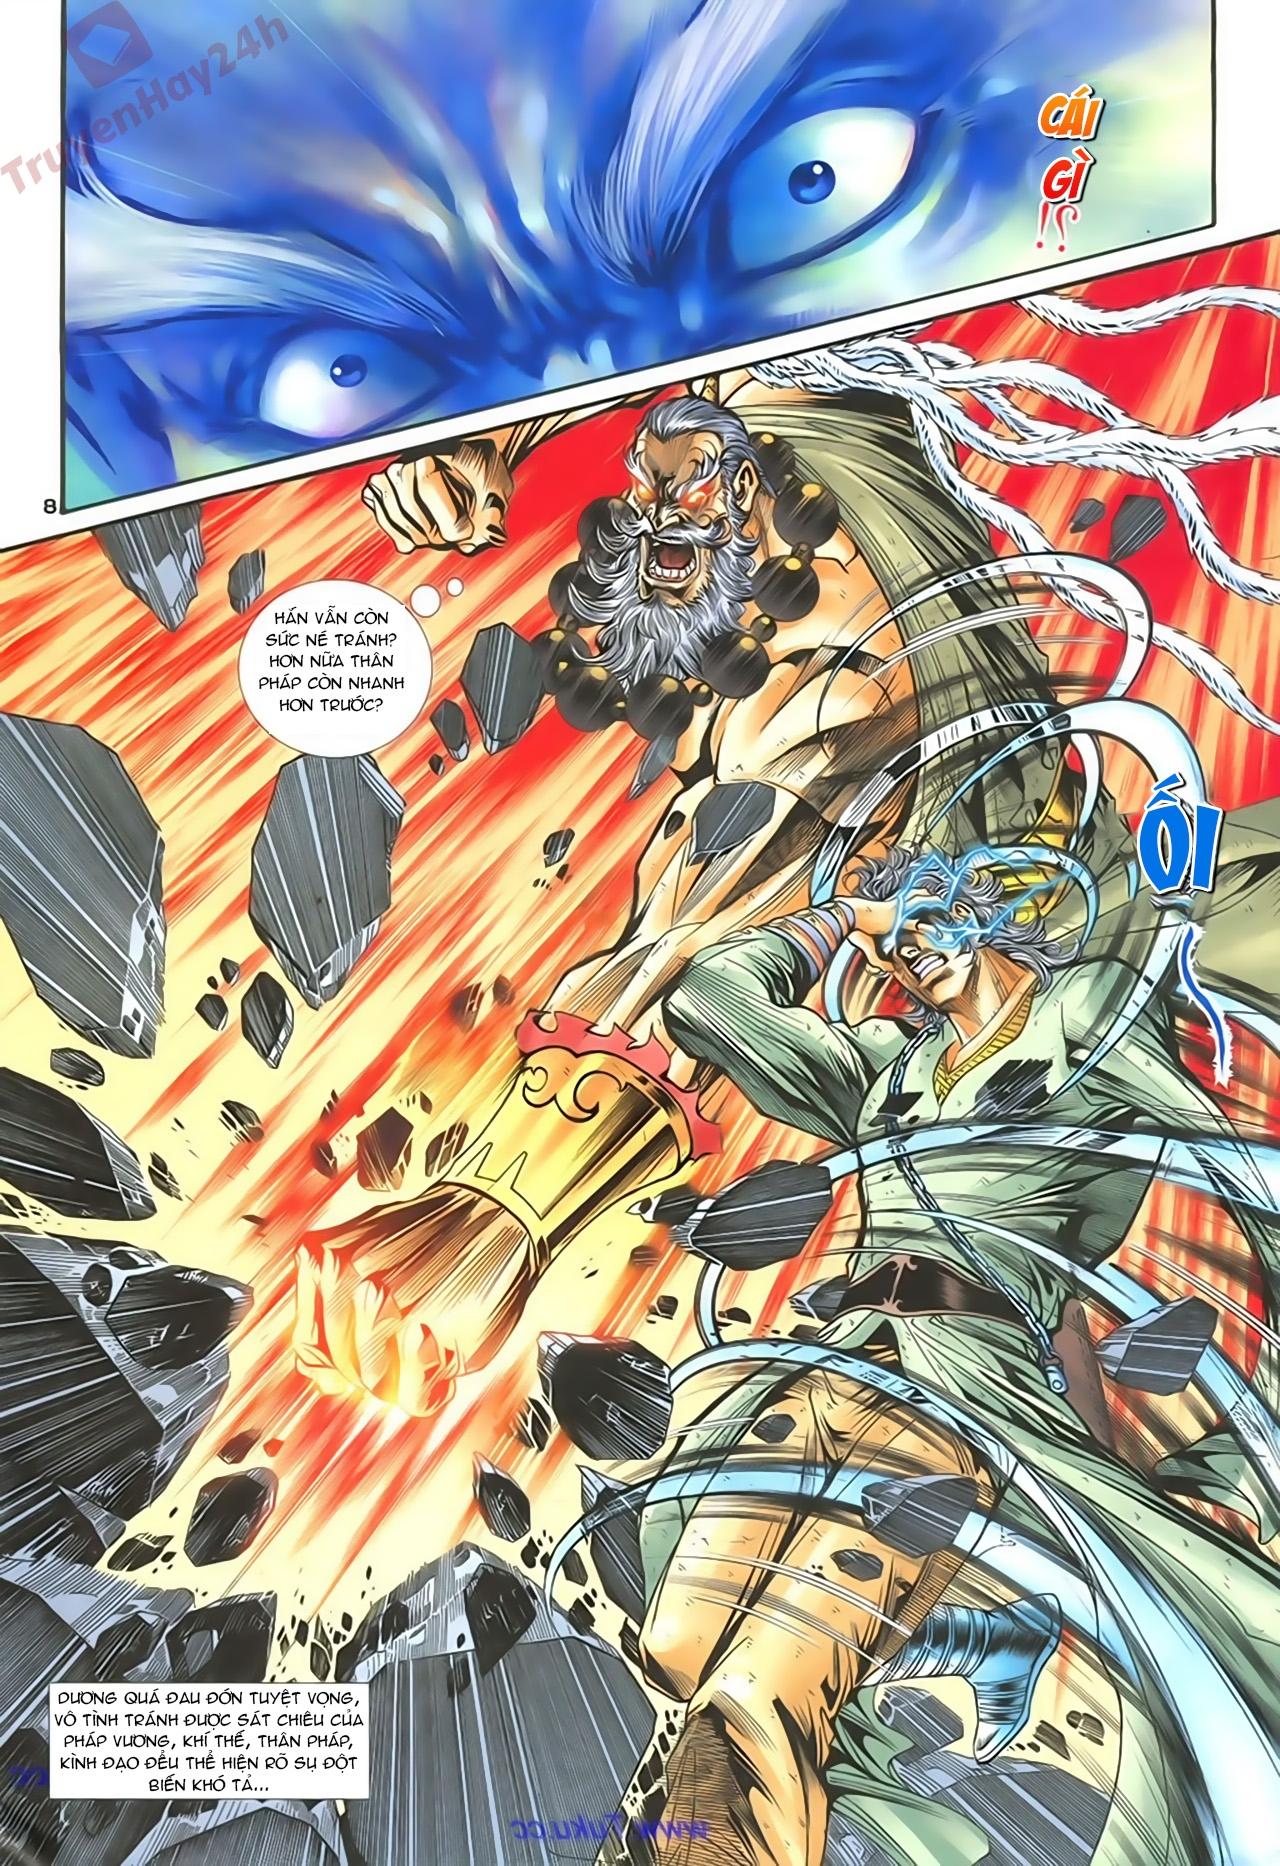 Thần Điêu Hiệp Lữ chap 86 – End Trang 8 - Mangak.info